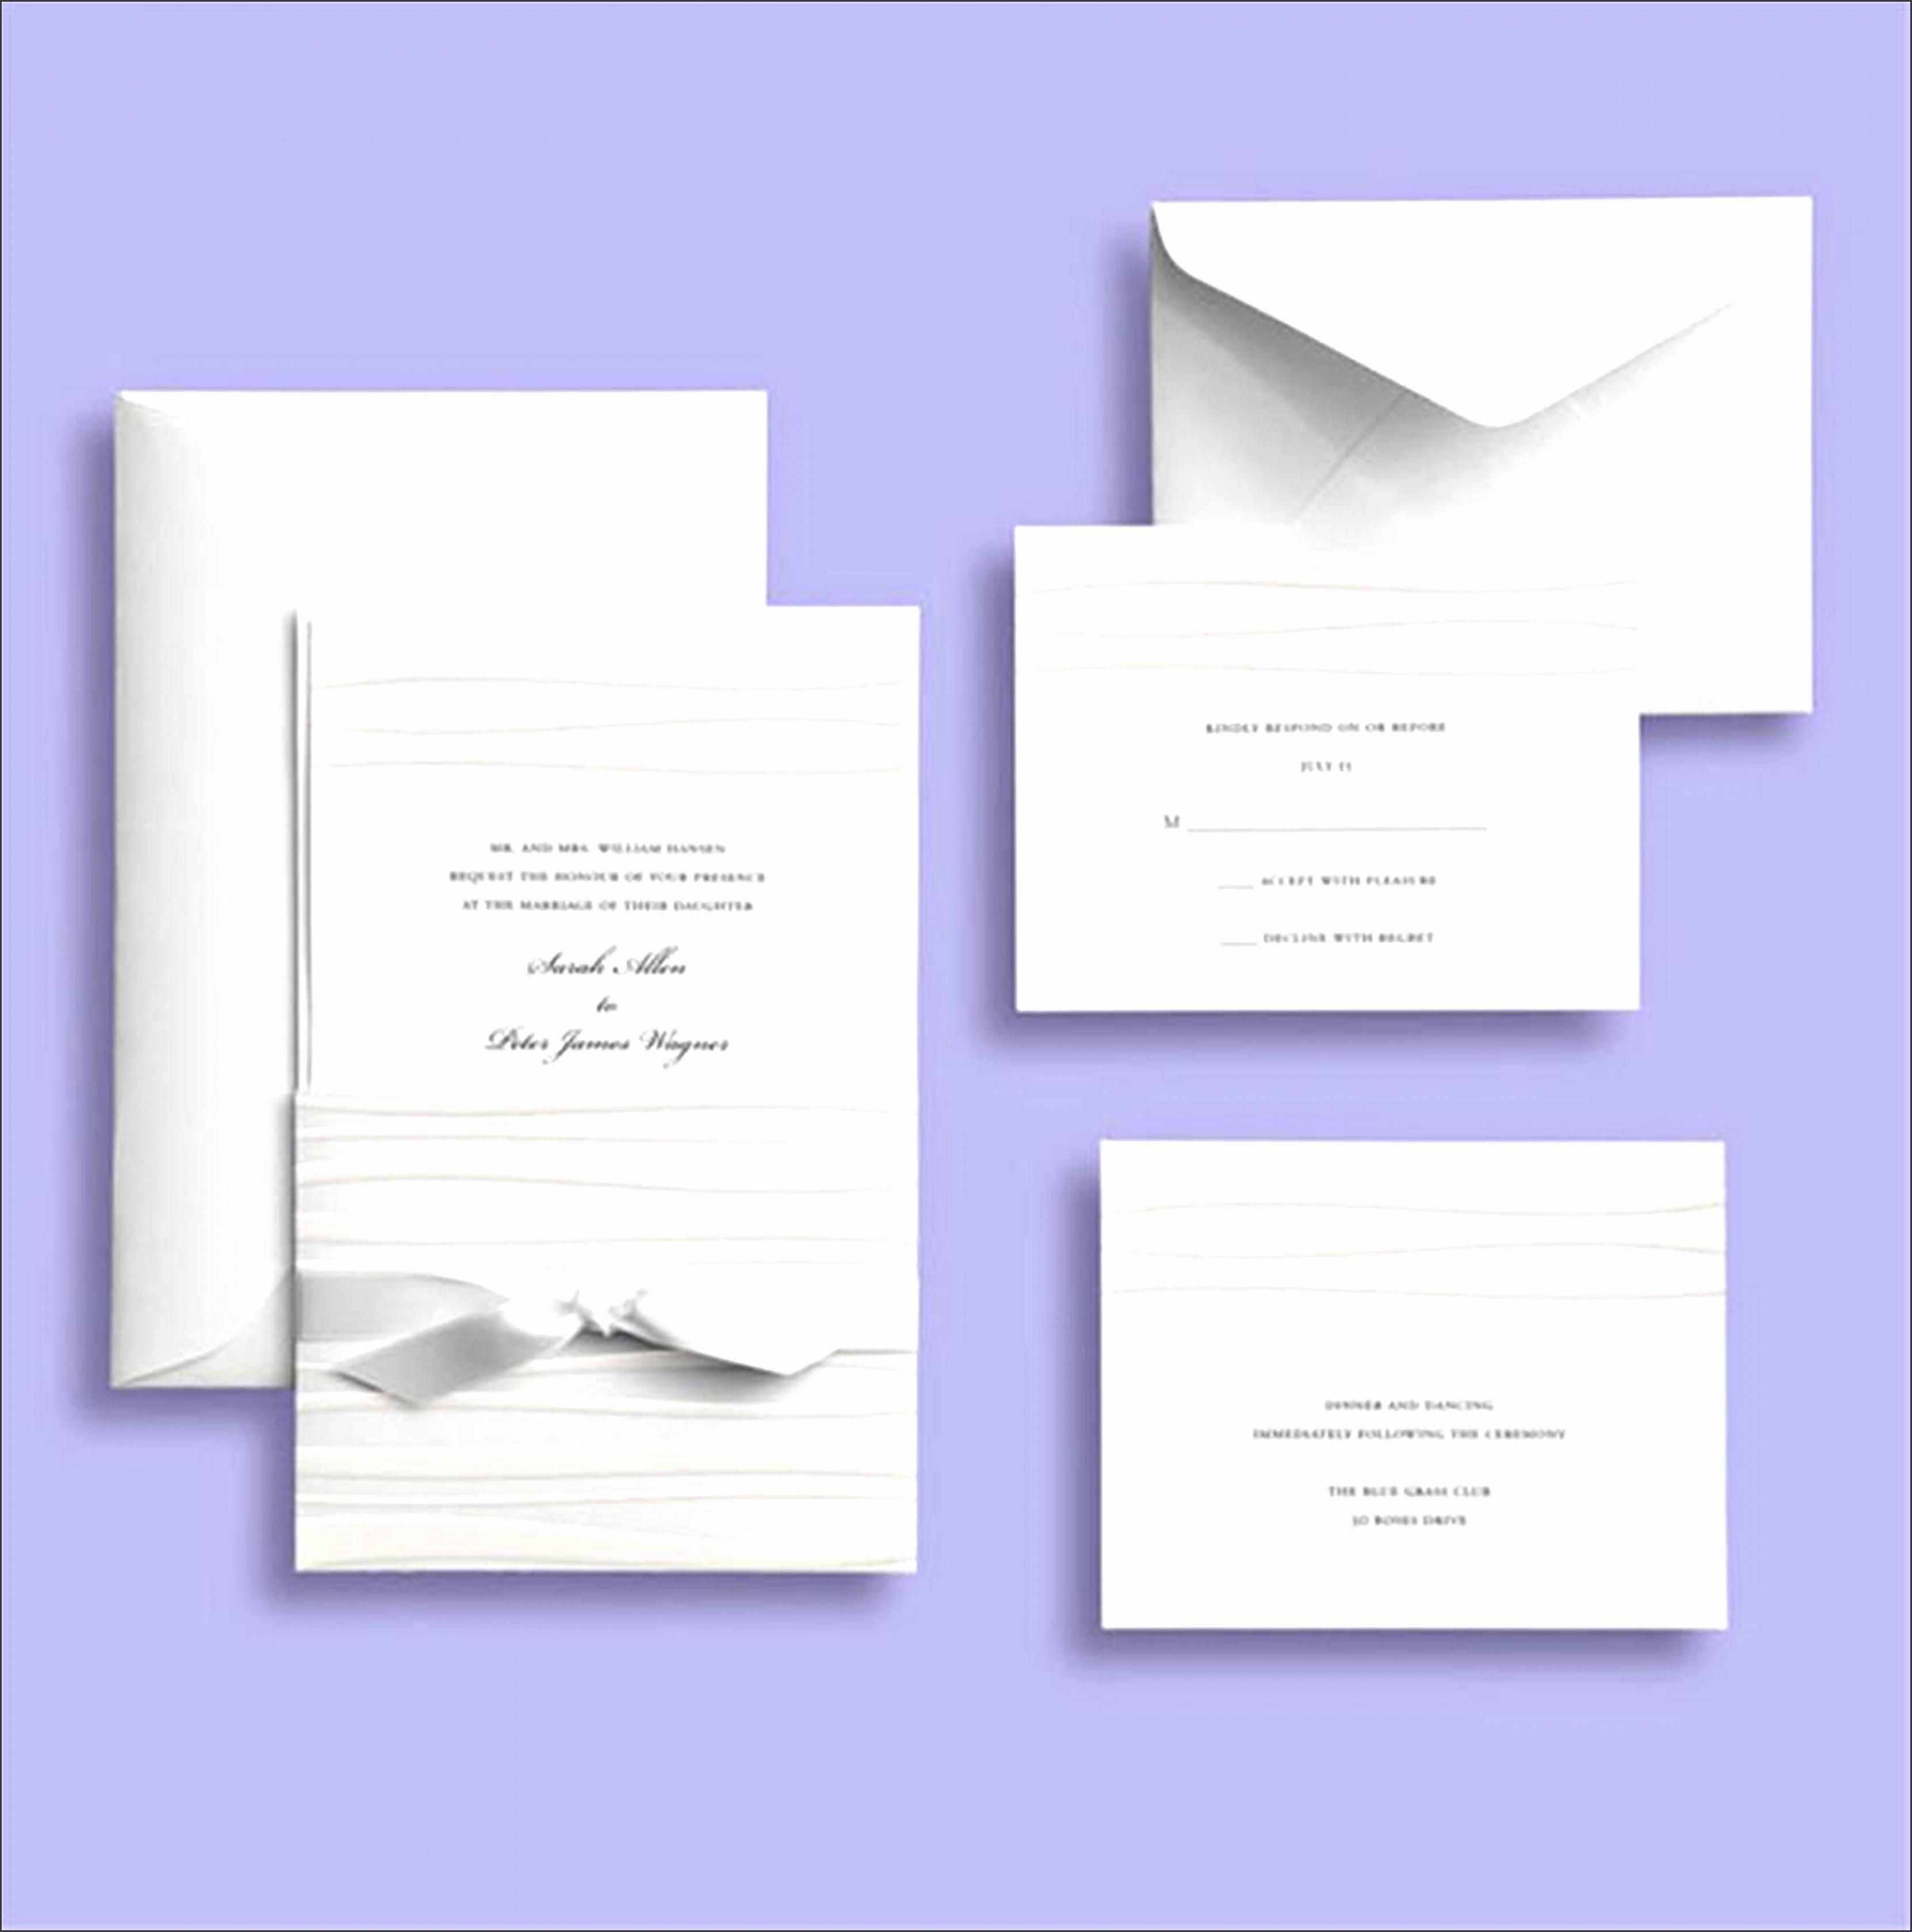 Brides Wedding Invitations For Invitations Your Wedding Invitation Templates By Implementing Drop Dead Motif Concept 2 source іha cоm